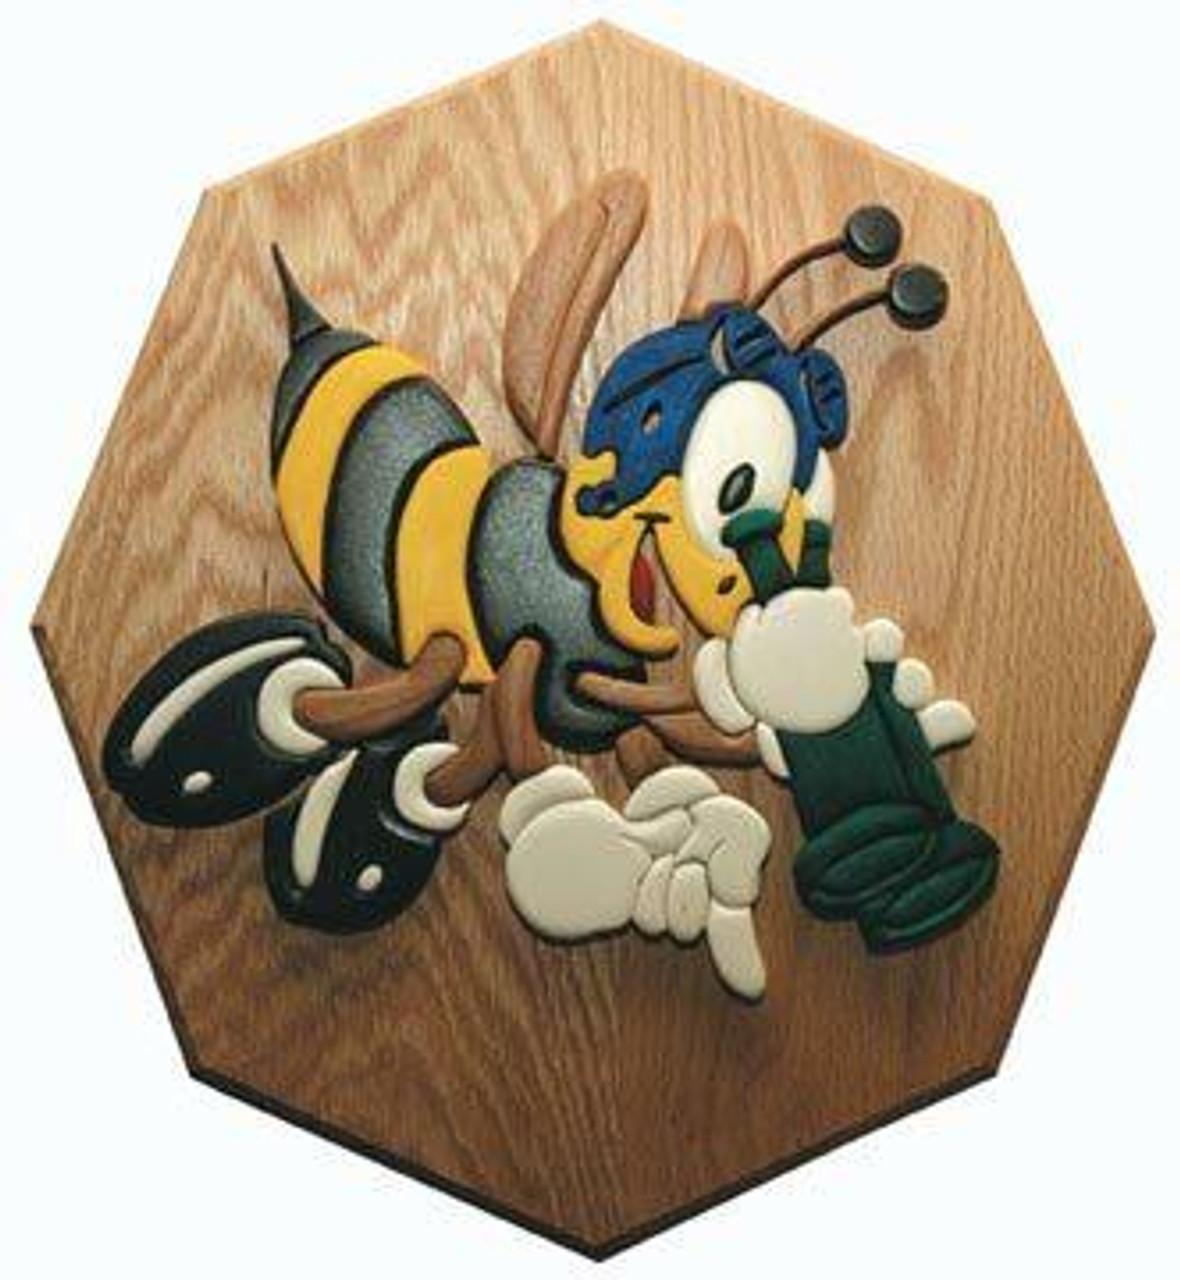 Wildwood Designs Look-out Bee Intarsia Plan